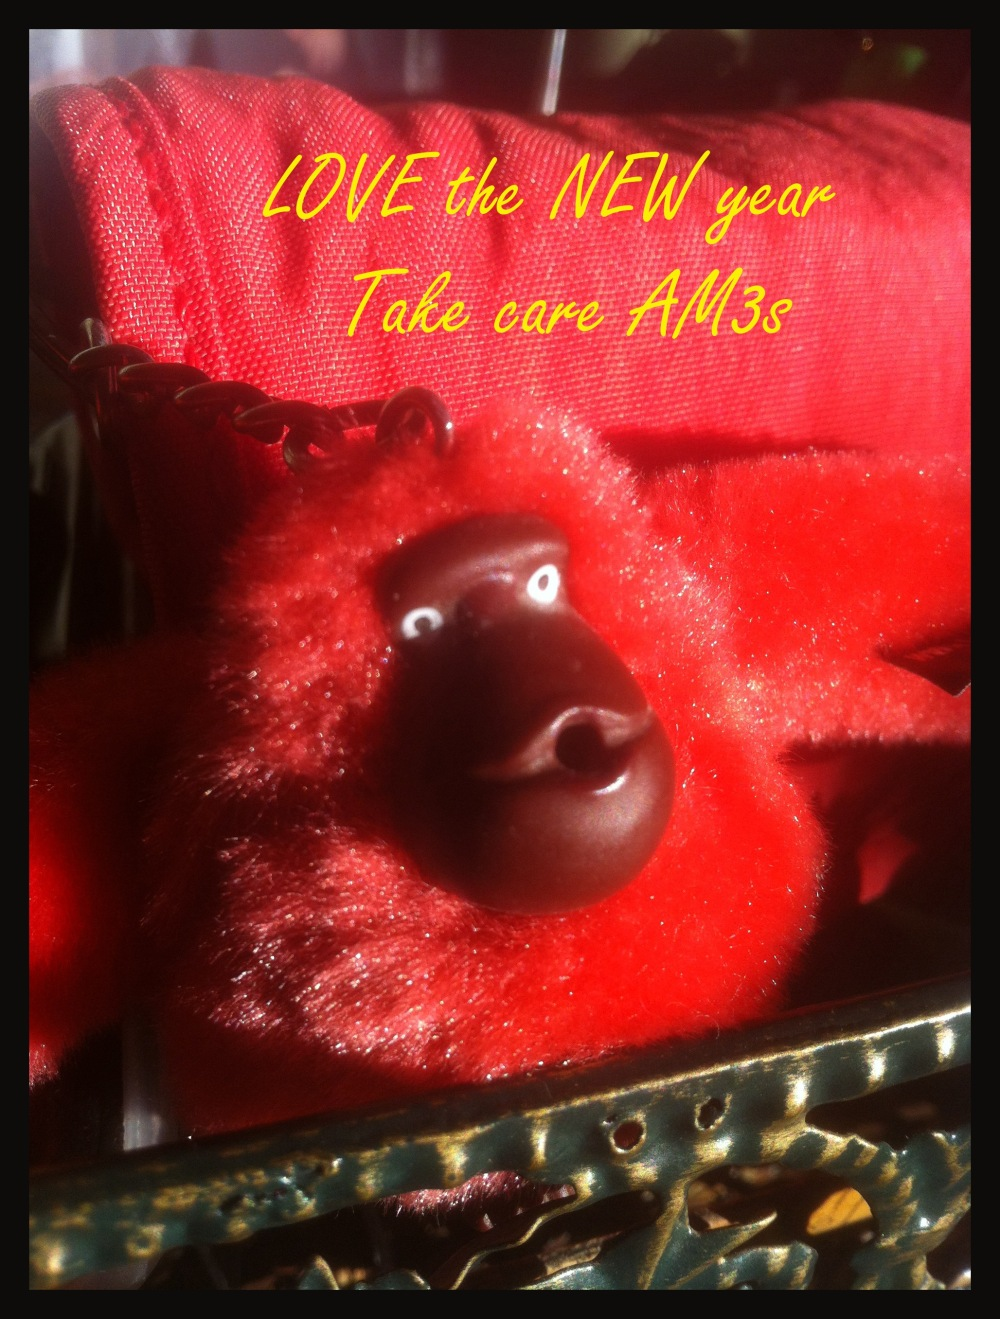 OOOOO I love the new year*